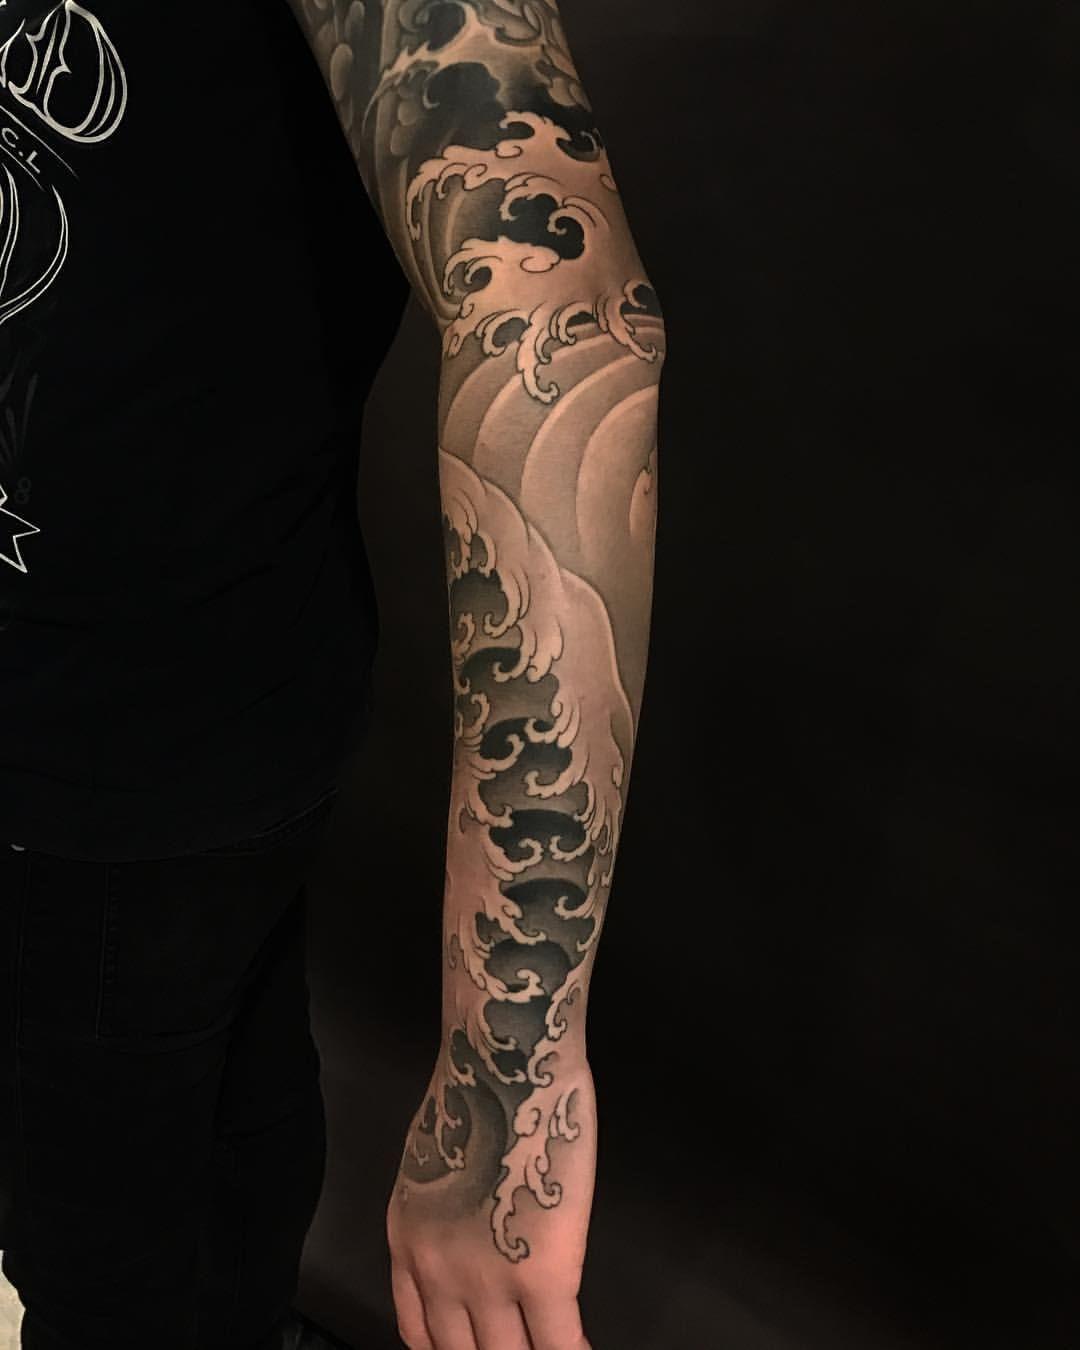 Diau bo tattoos alone tattoo polynesian tattoo